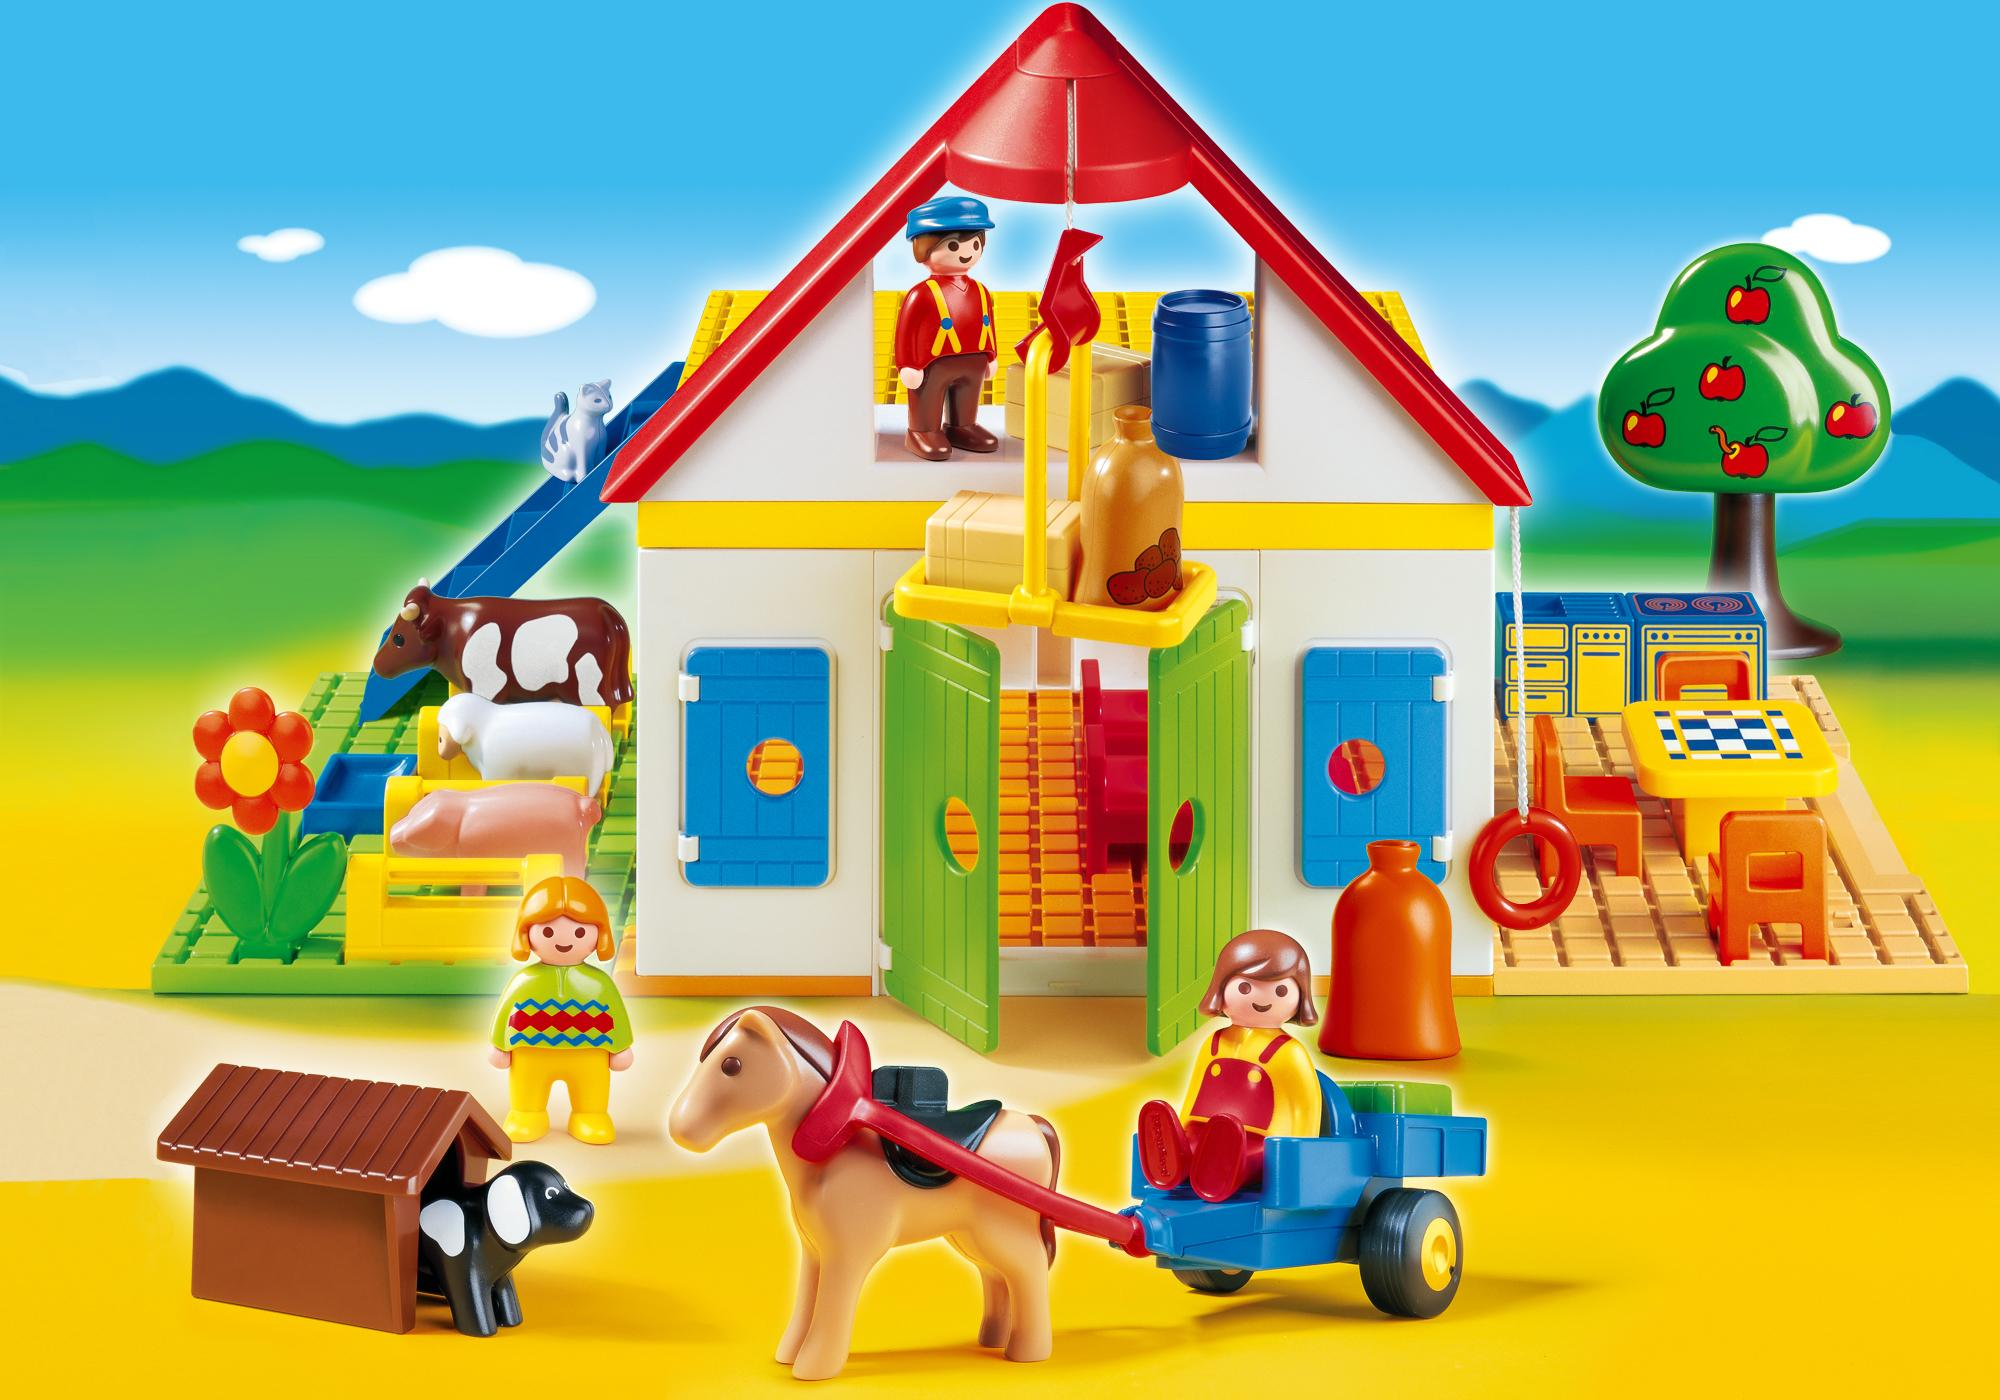 http://media.playmobil.com/i/playmobil/6750-A_product_detail/Mein großer Bauernhof